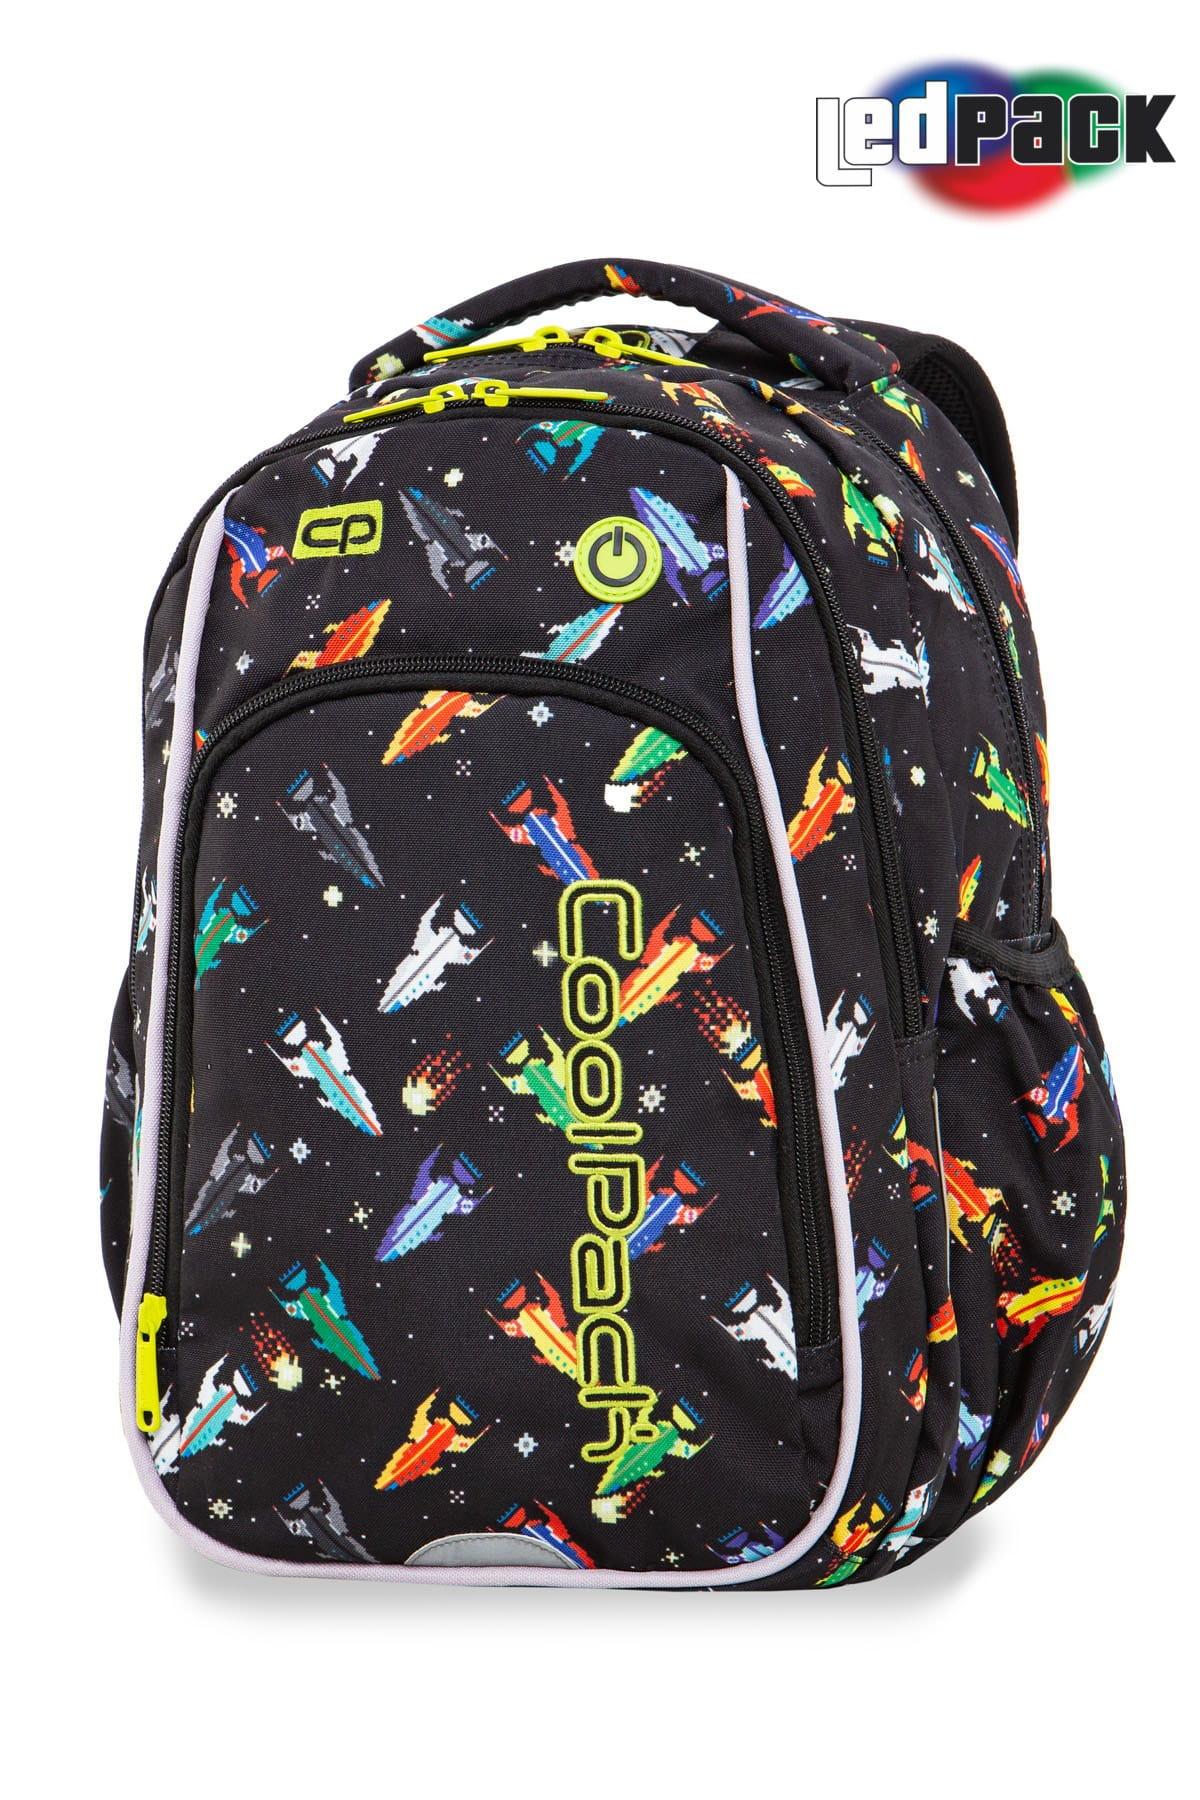 fbf0e933e9fb0 Plecak szkolny Coolpack Strike S LED Rockets 94764CP A18207